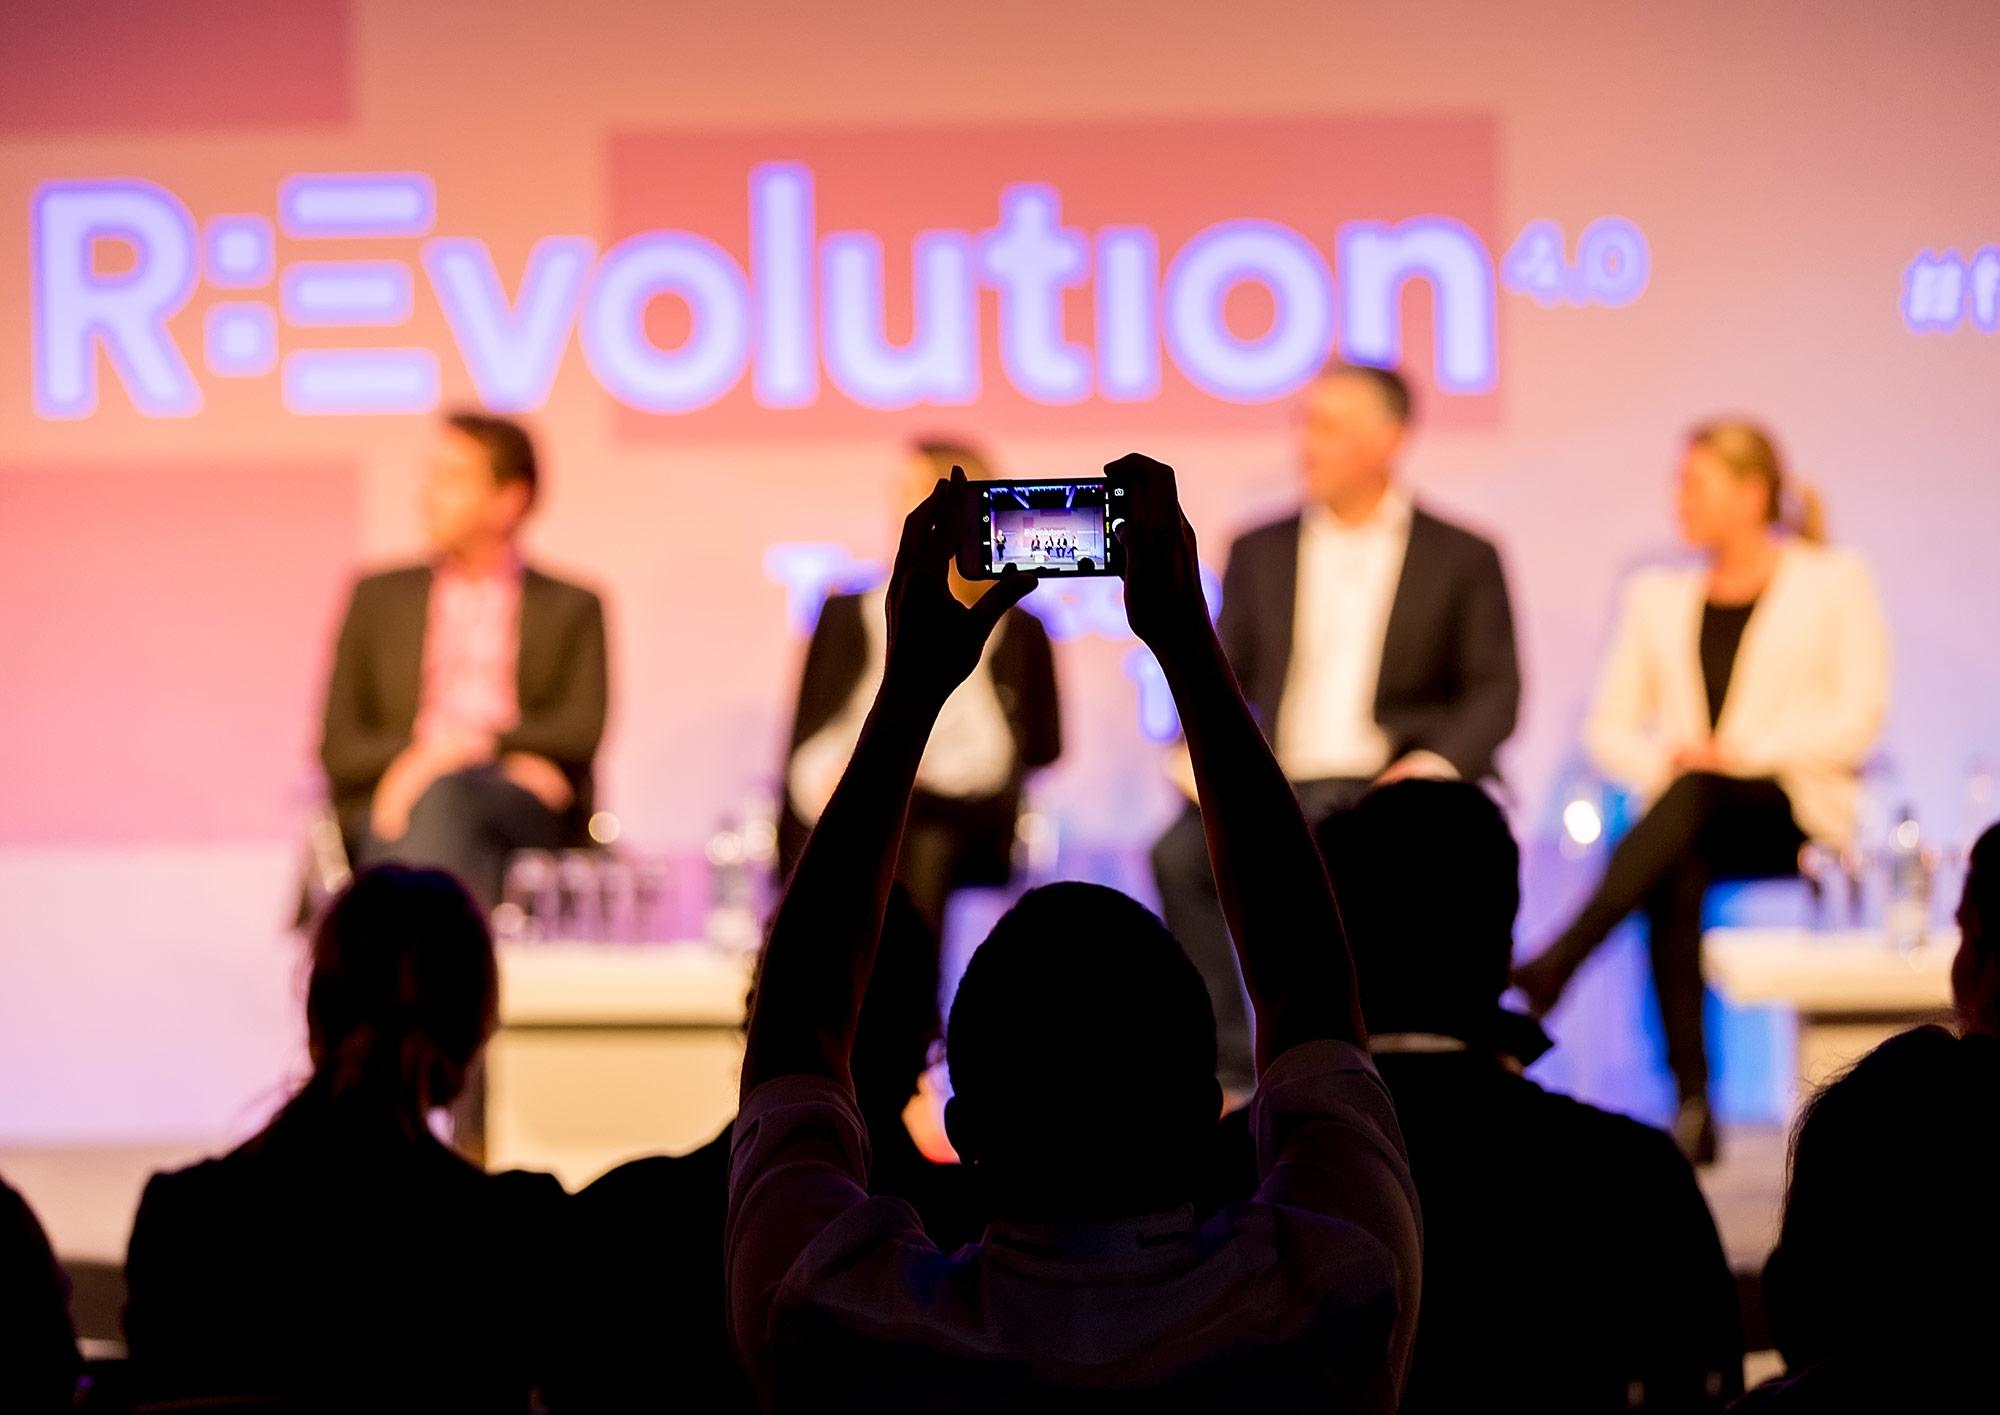 Revolution 4.0 - audience